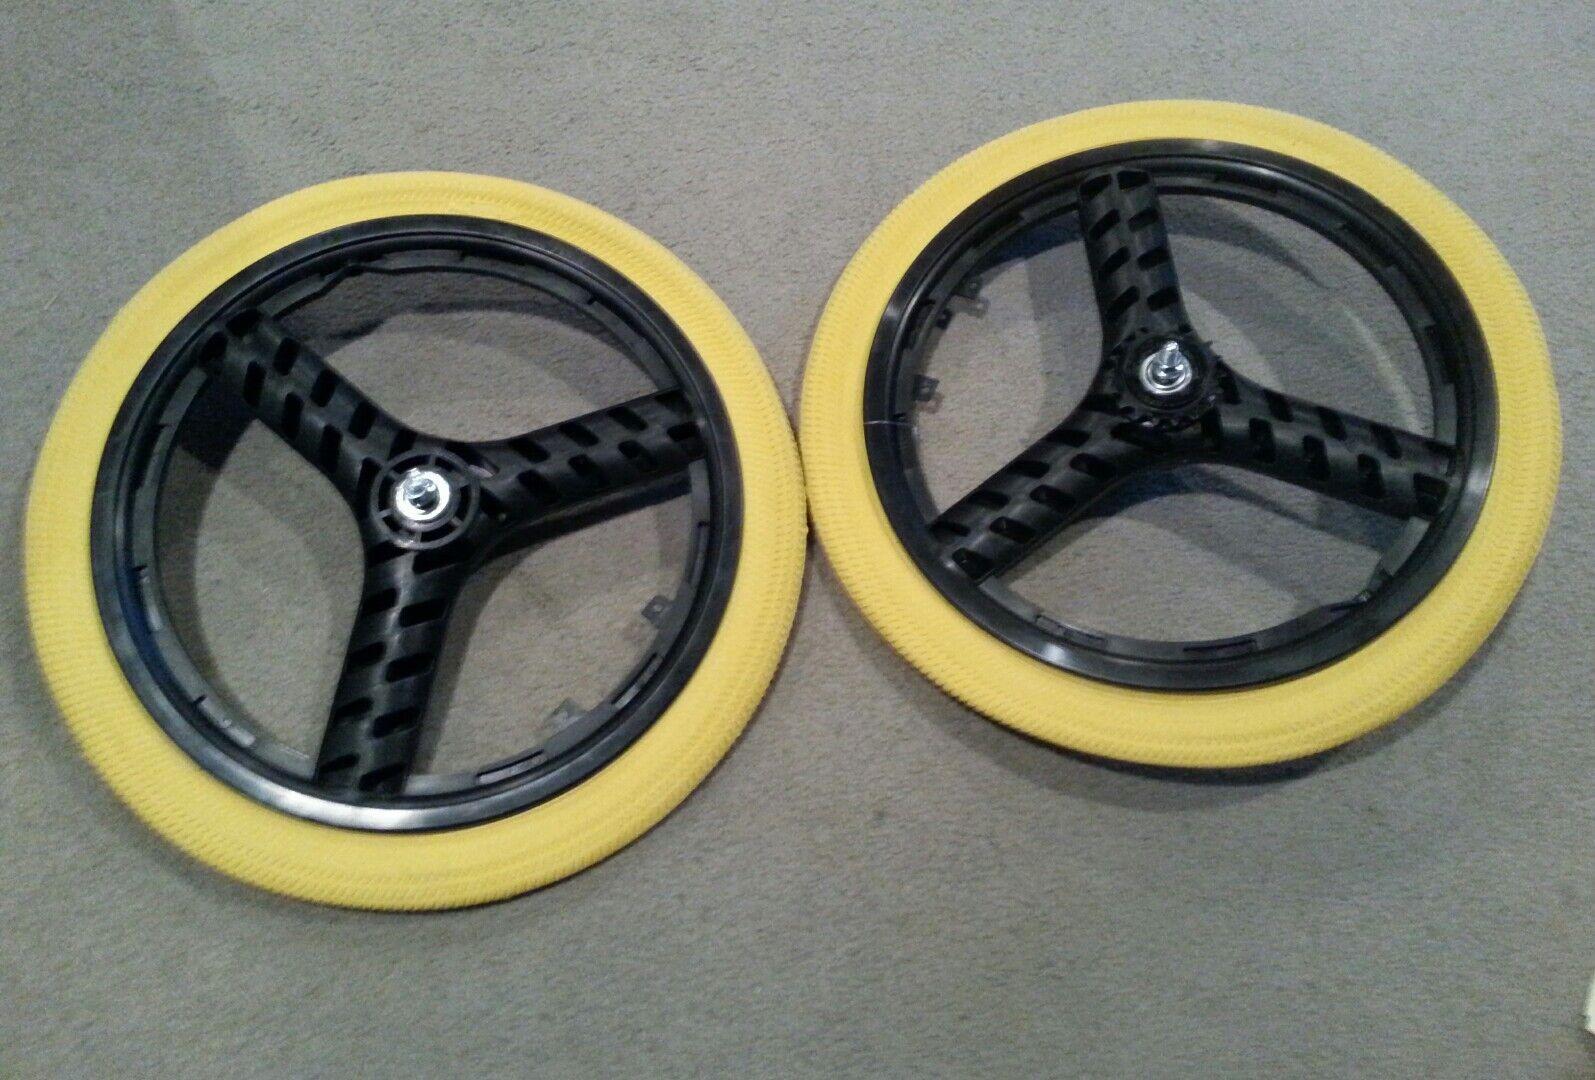 Nuevo 20  MAG Ruedas de 3 radios Amarillo Neumáticos Tubos Para Gt Dyno Haro o BMX Bicicletas